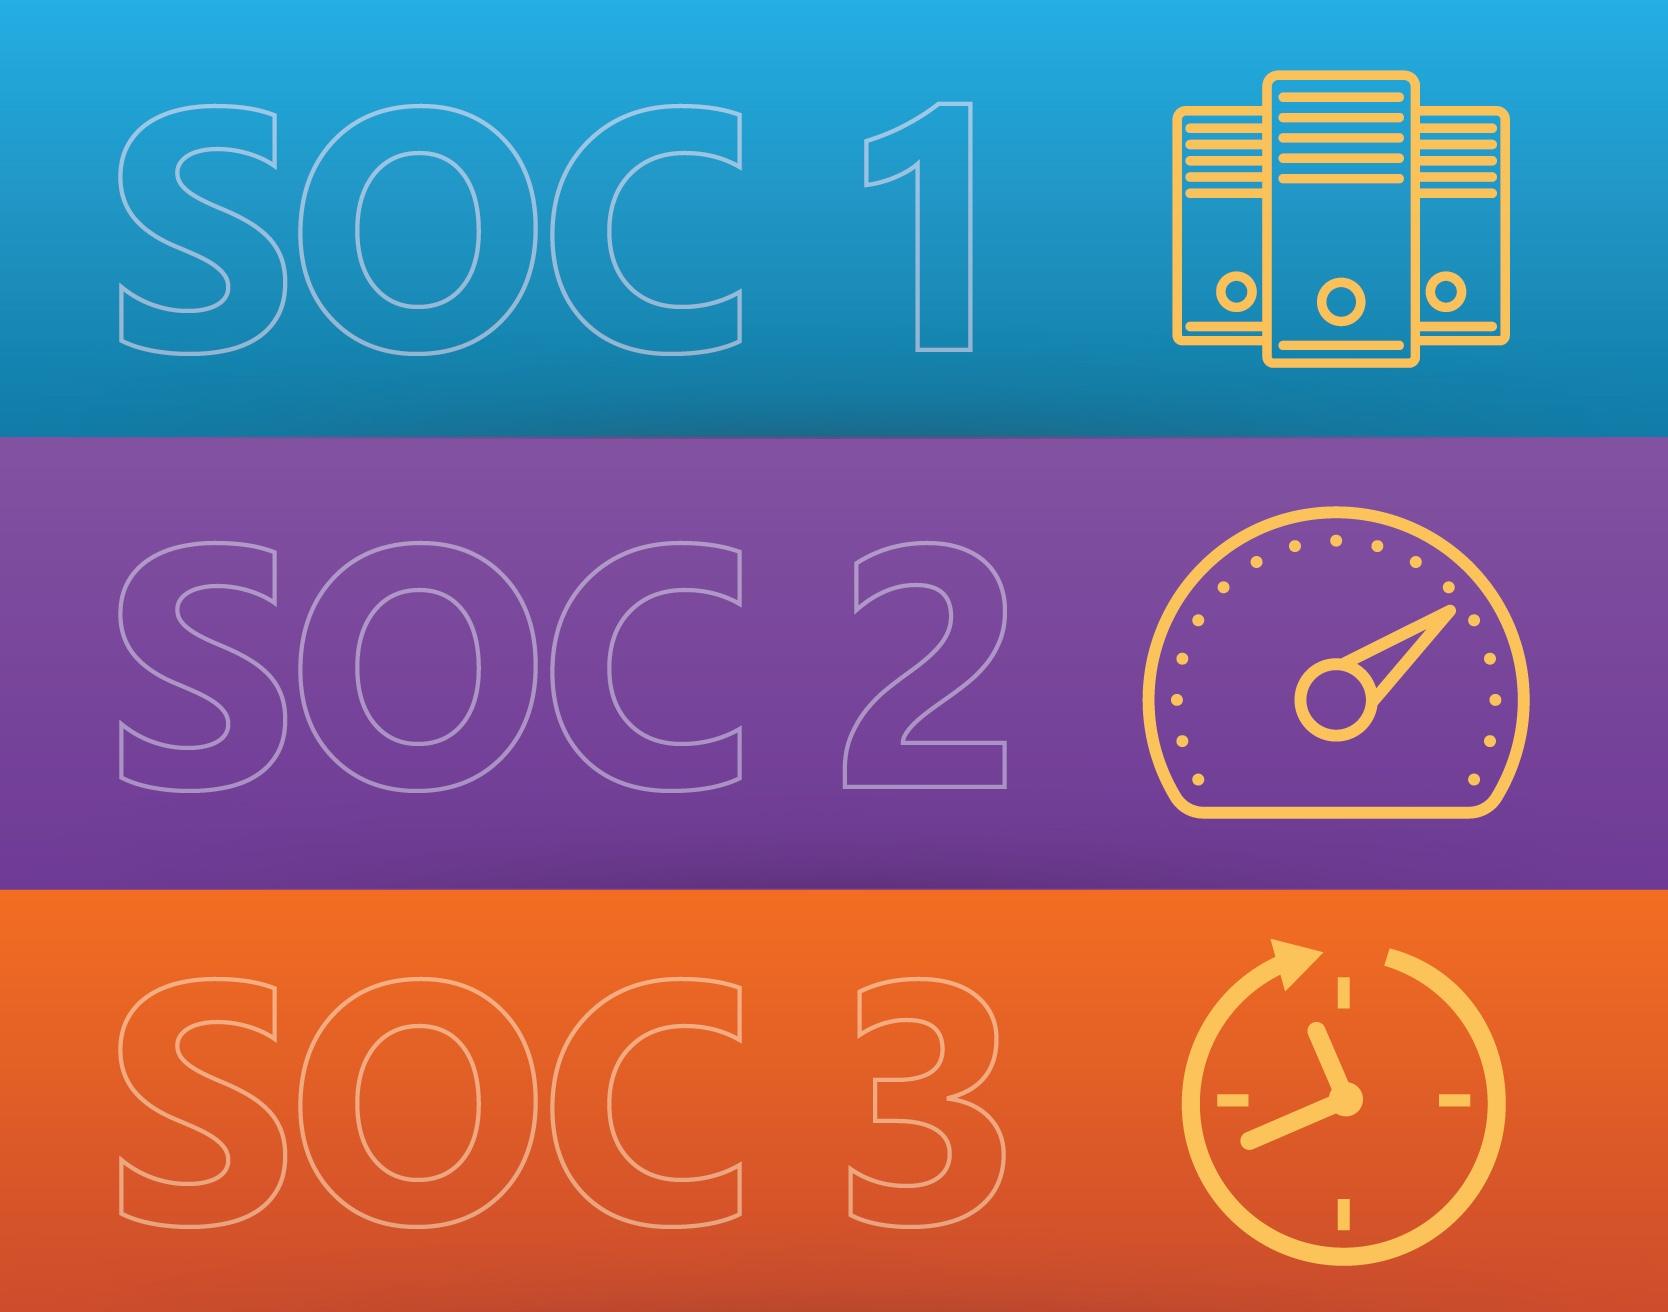 resources understanding differences between soc reports 1 2 3 infographic